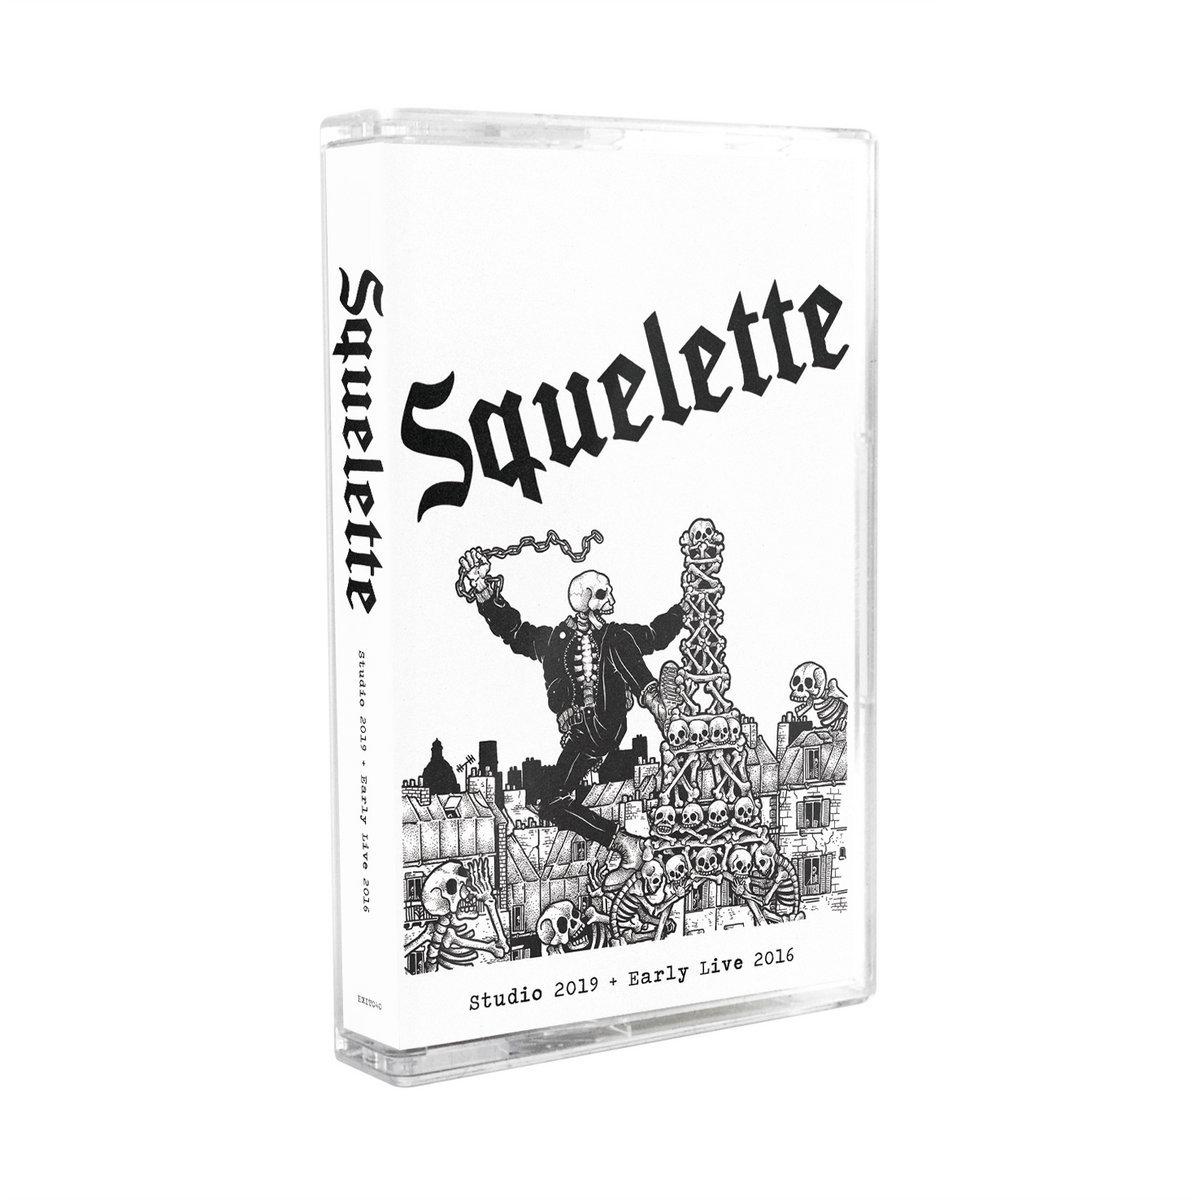 CS-SQUELLET-1.jpg